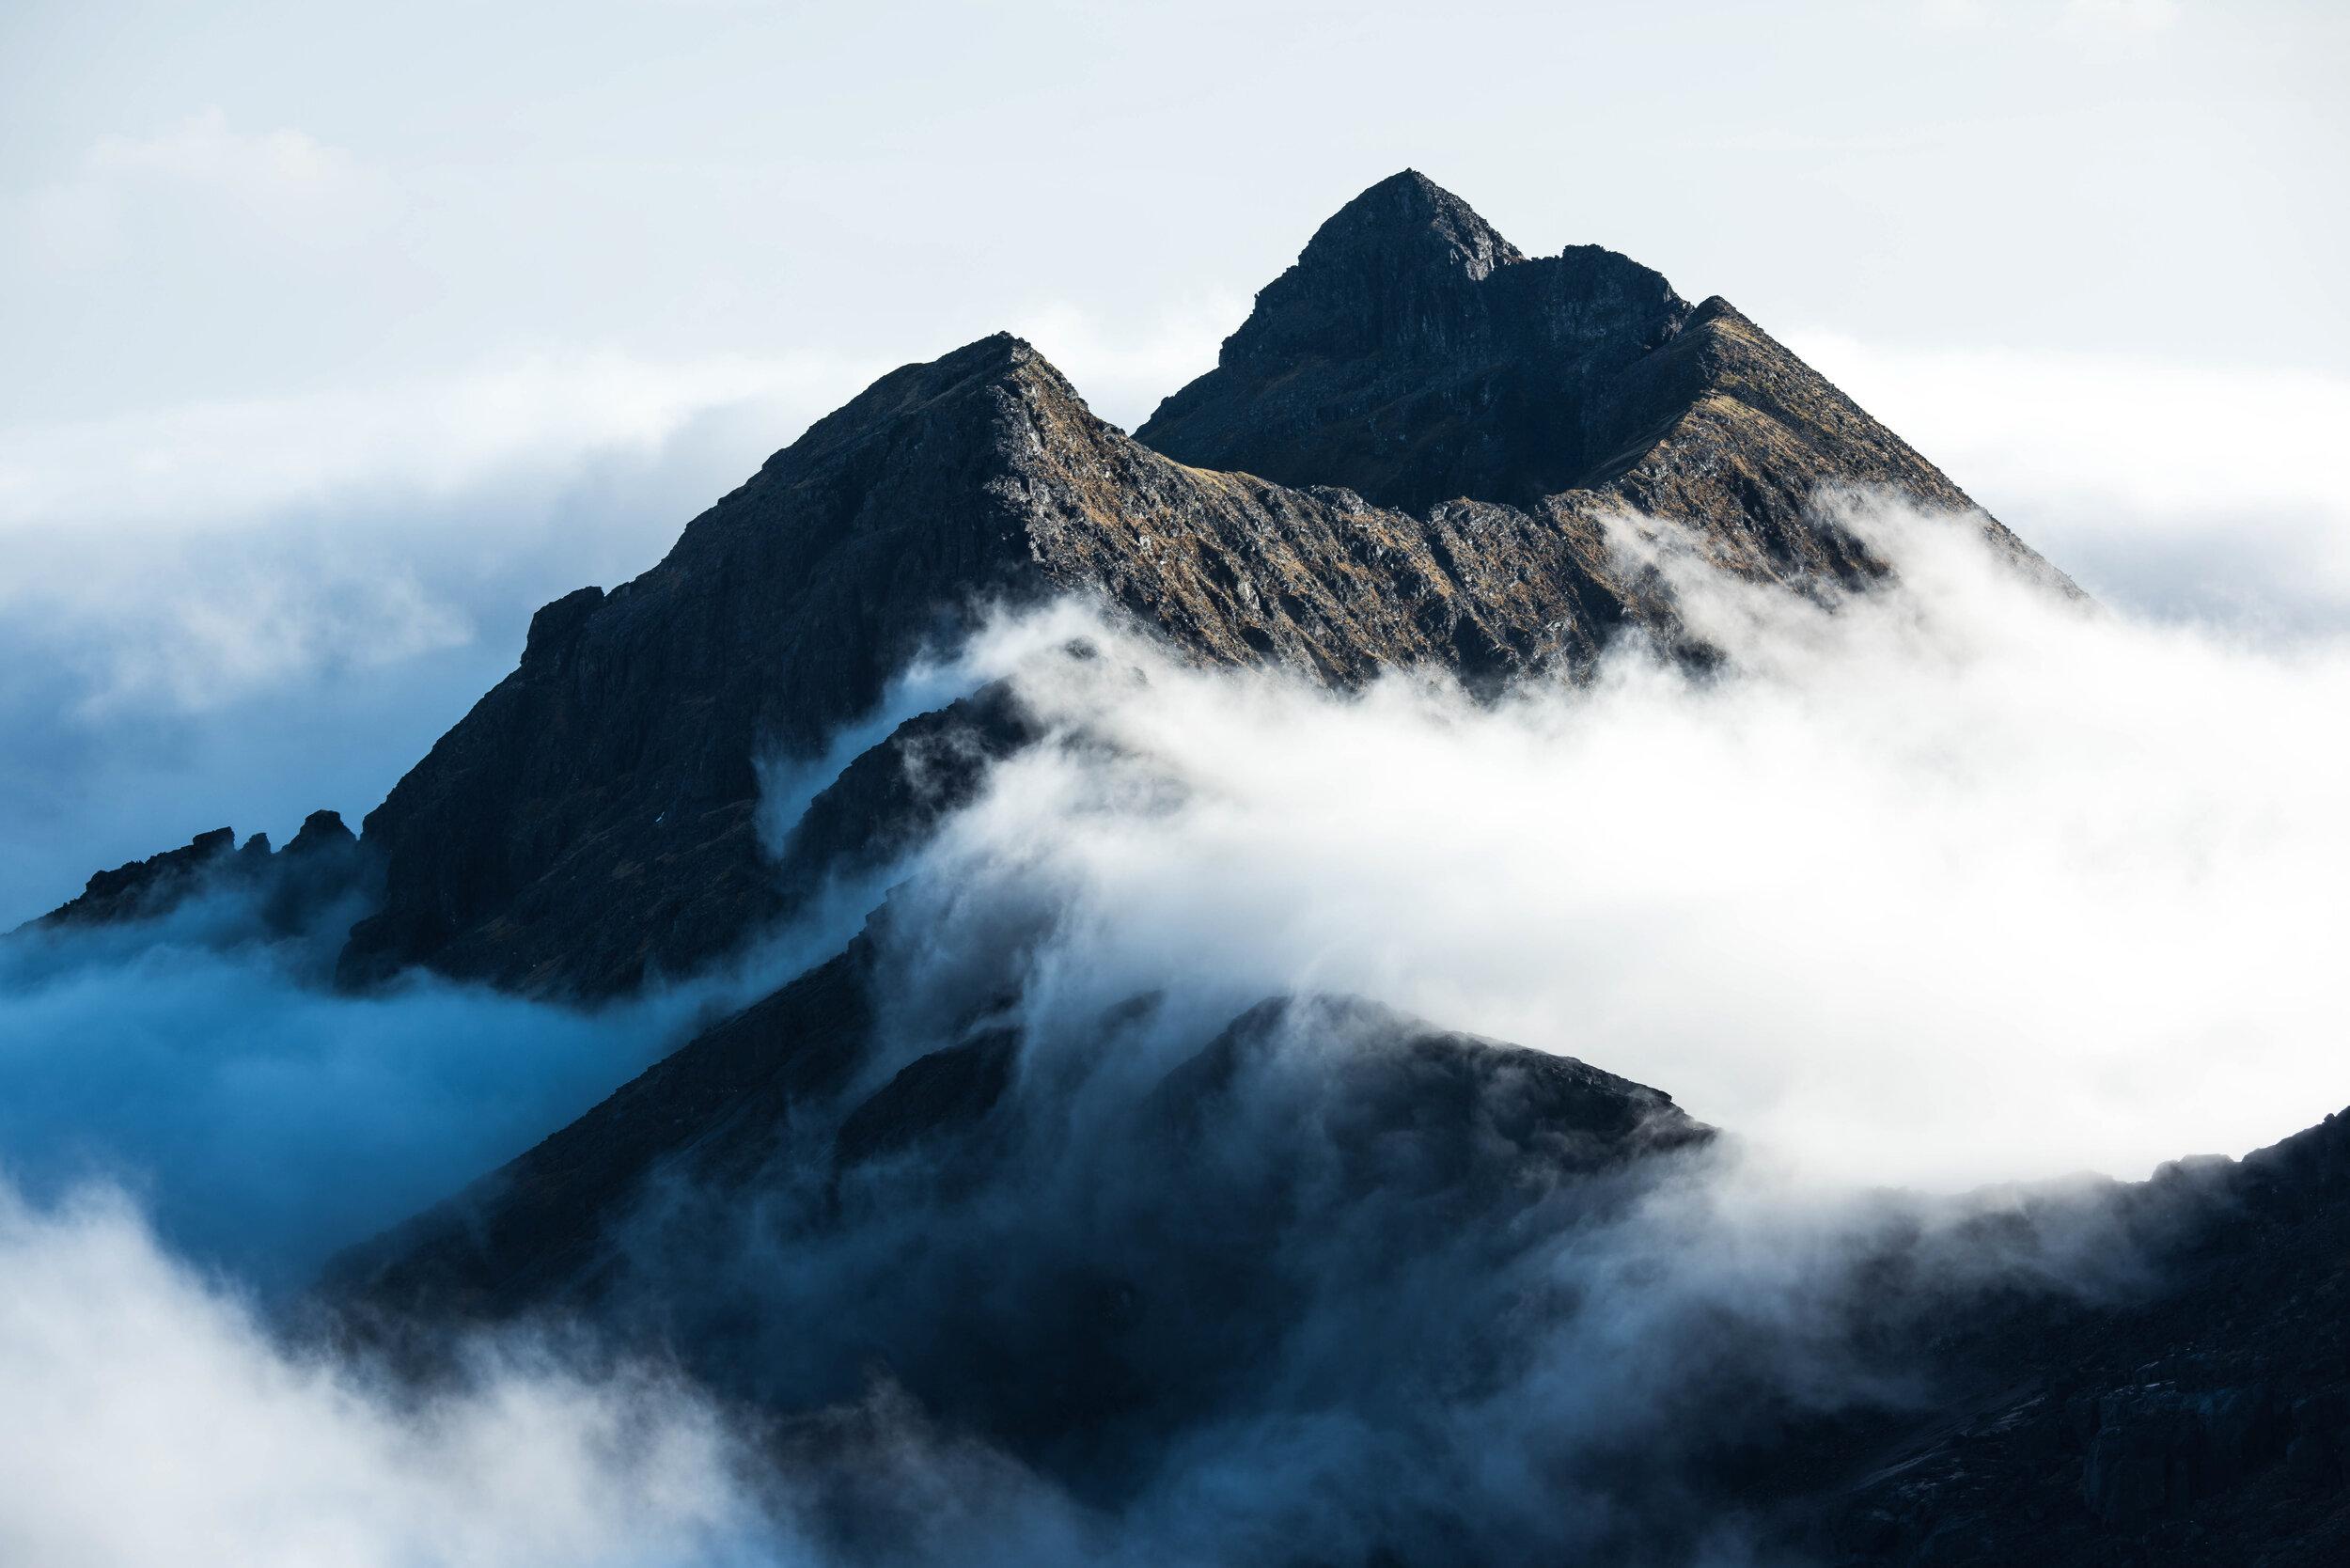 Cloud rolls over Sgurr Alisdair on Skye